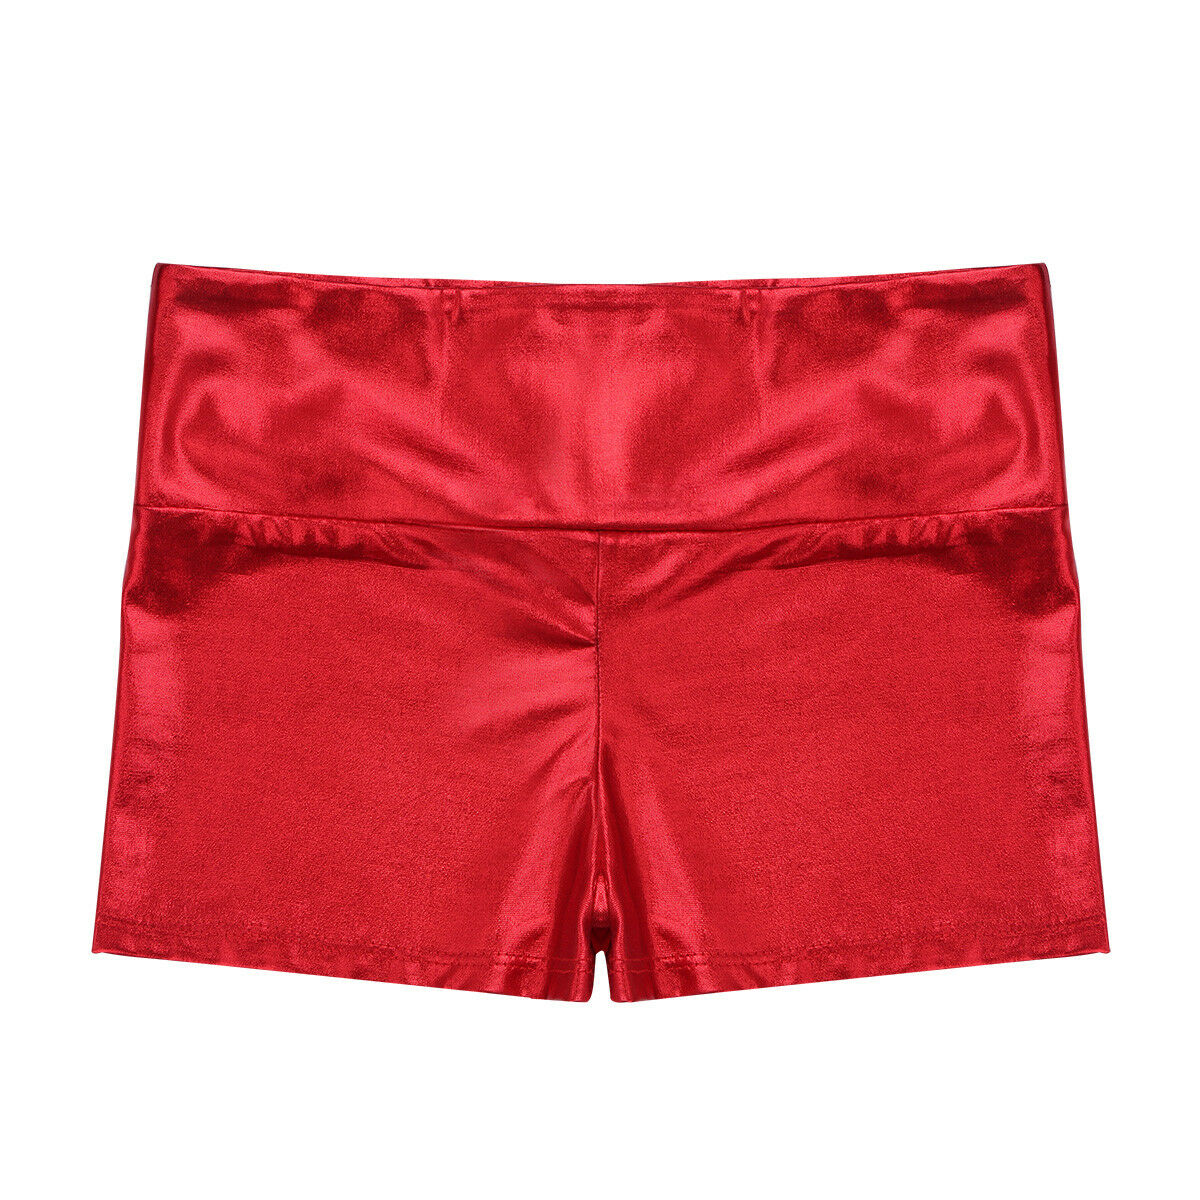 Kid Girl Metallic Shiny Shorts Ballet Jazz Dance Wear Sports Bottoms Gym Costume